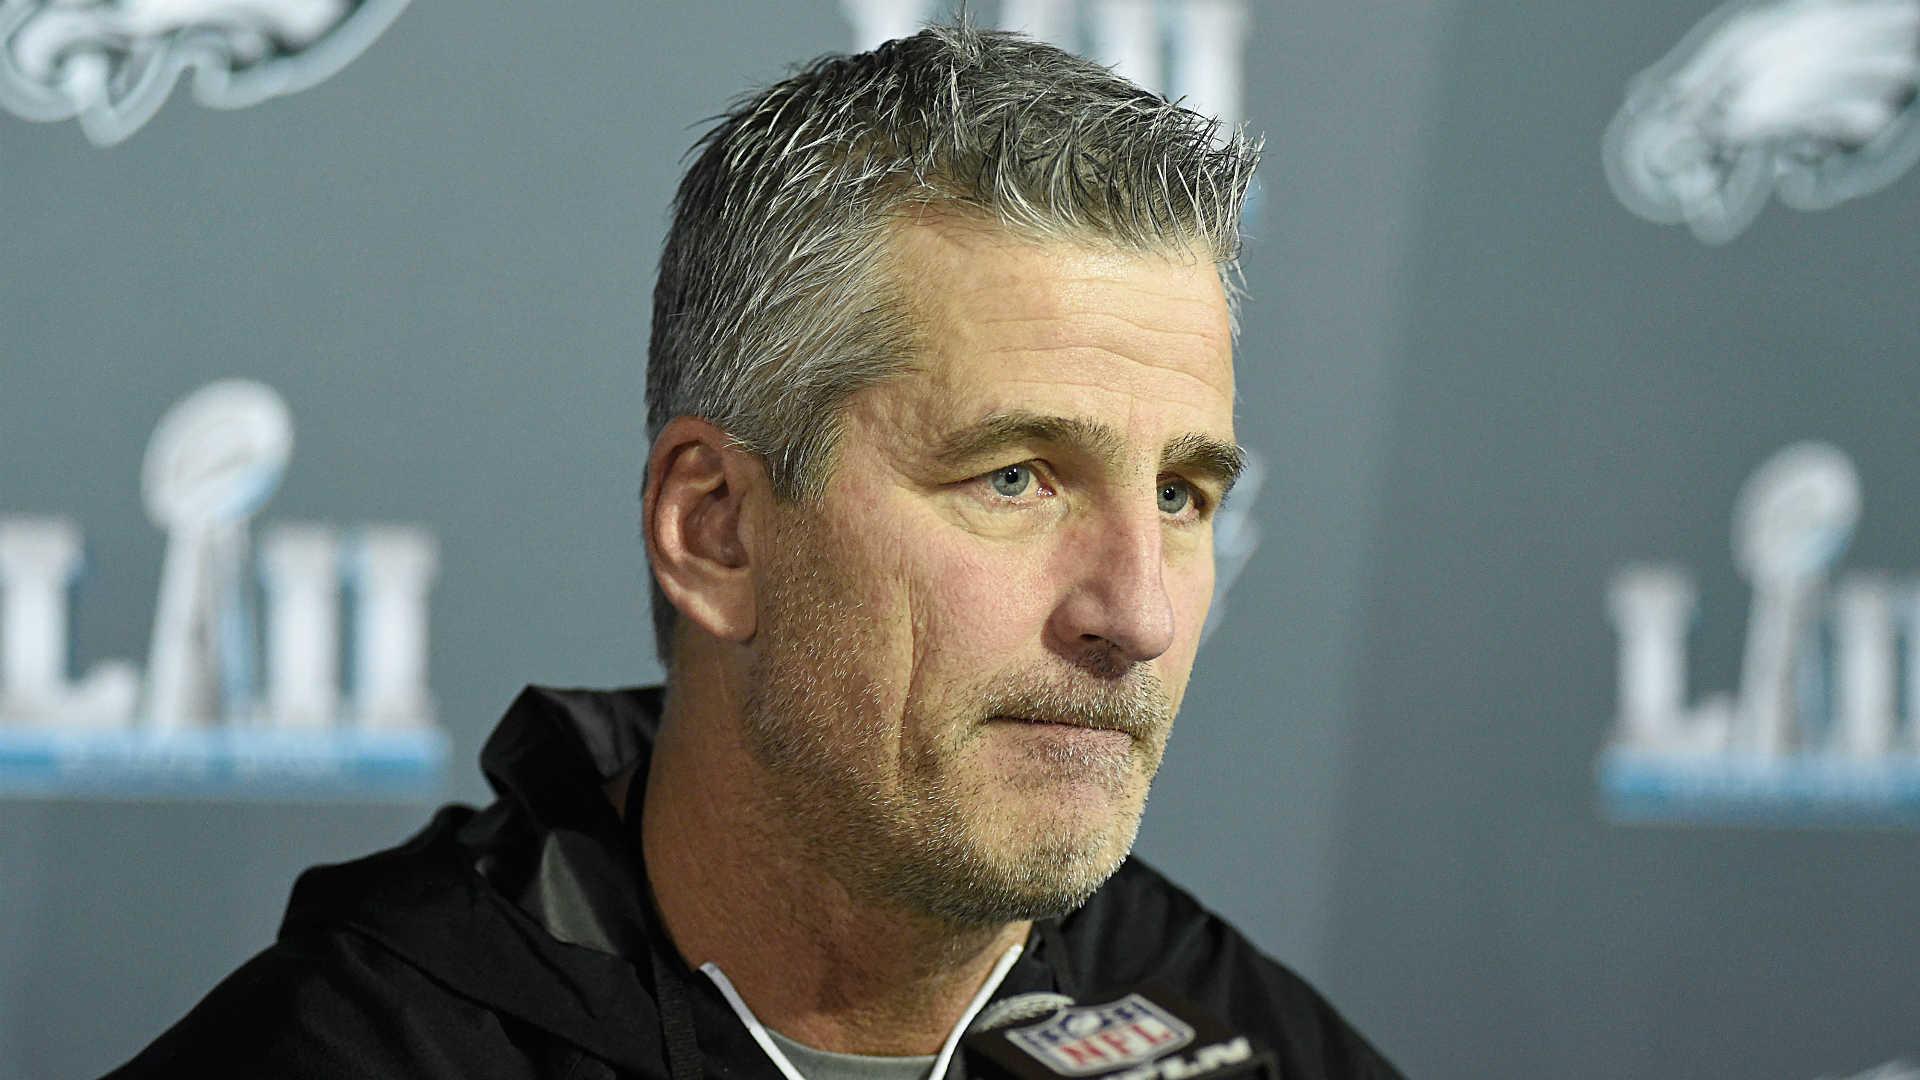 SN source: Colts hiring 49ers legend to coach running backs